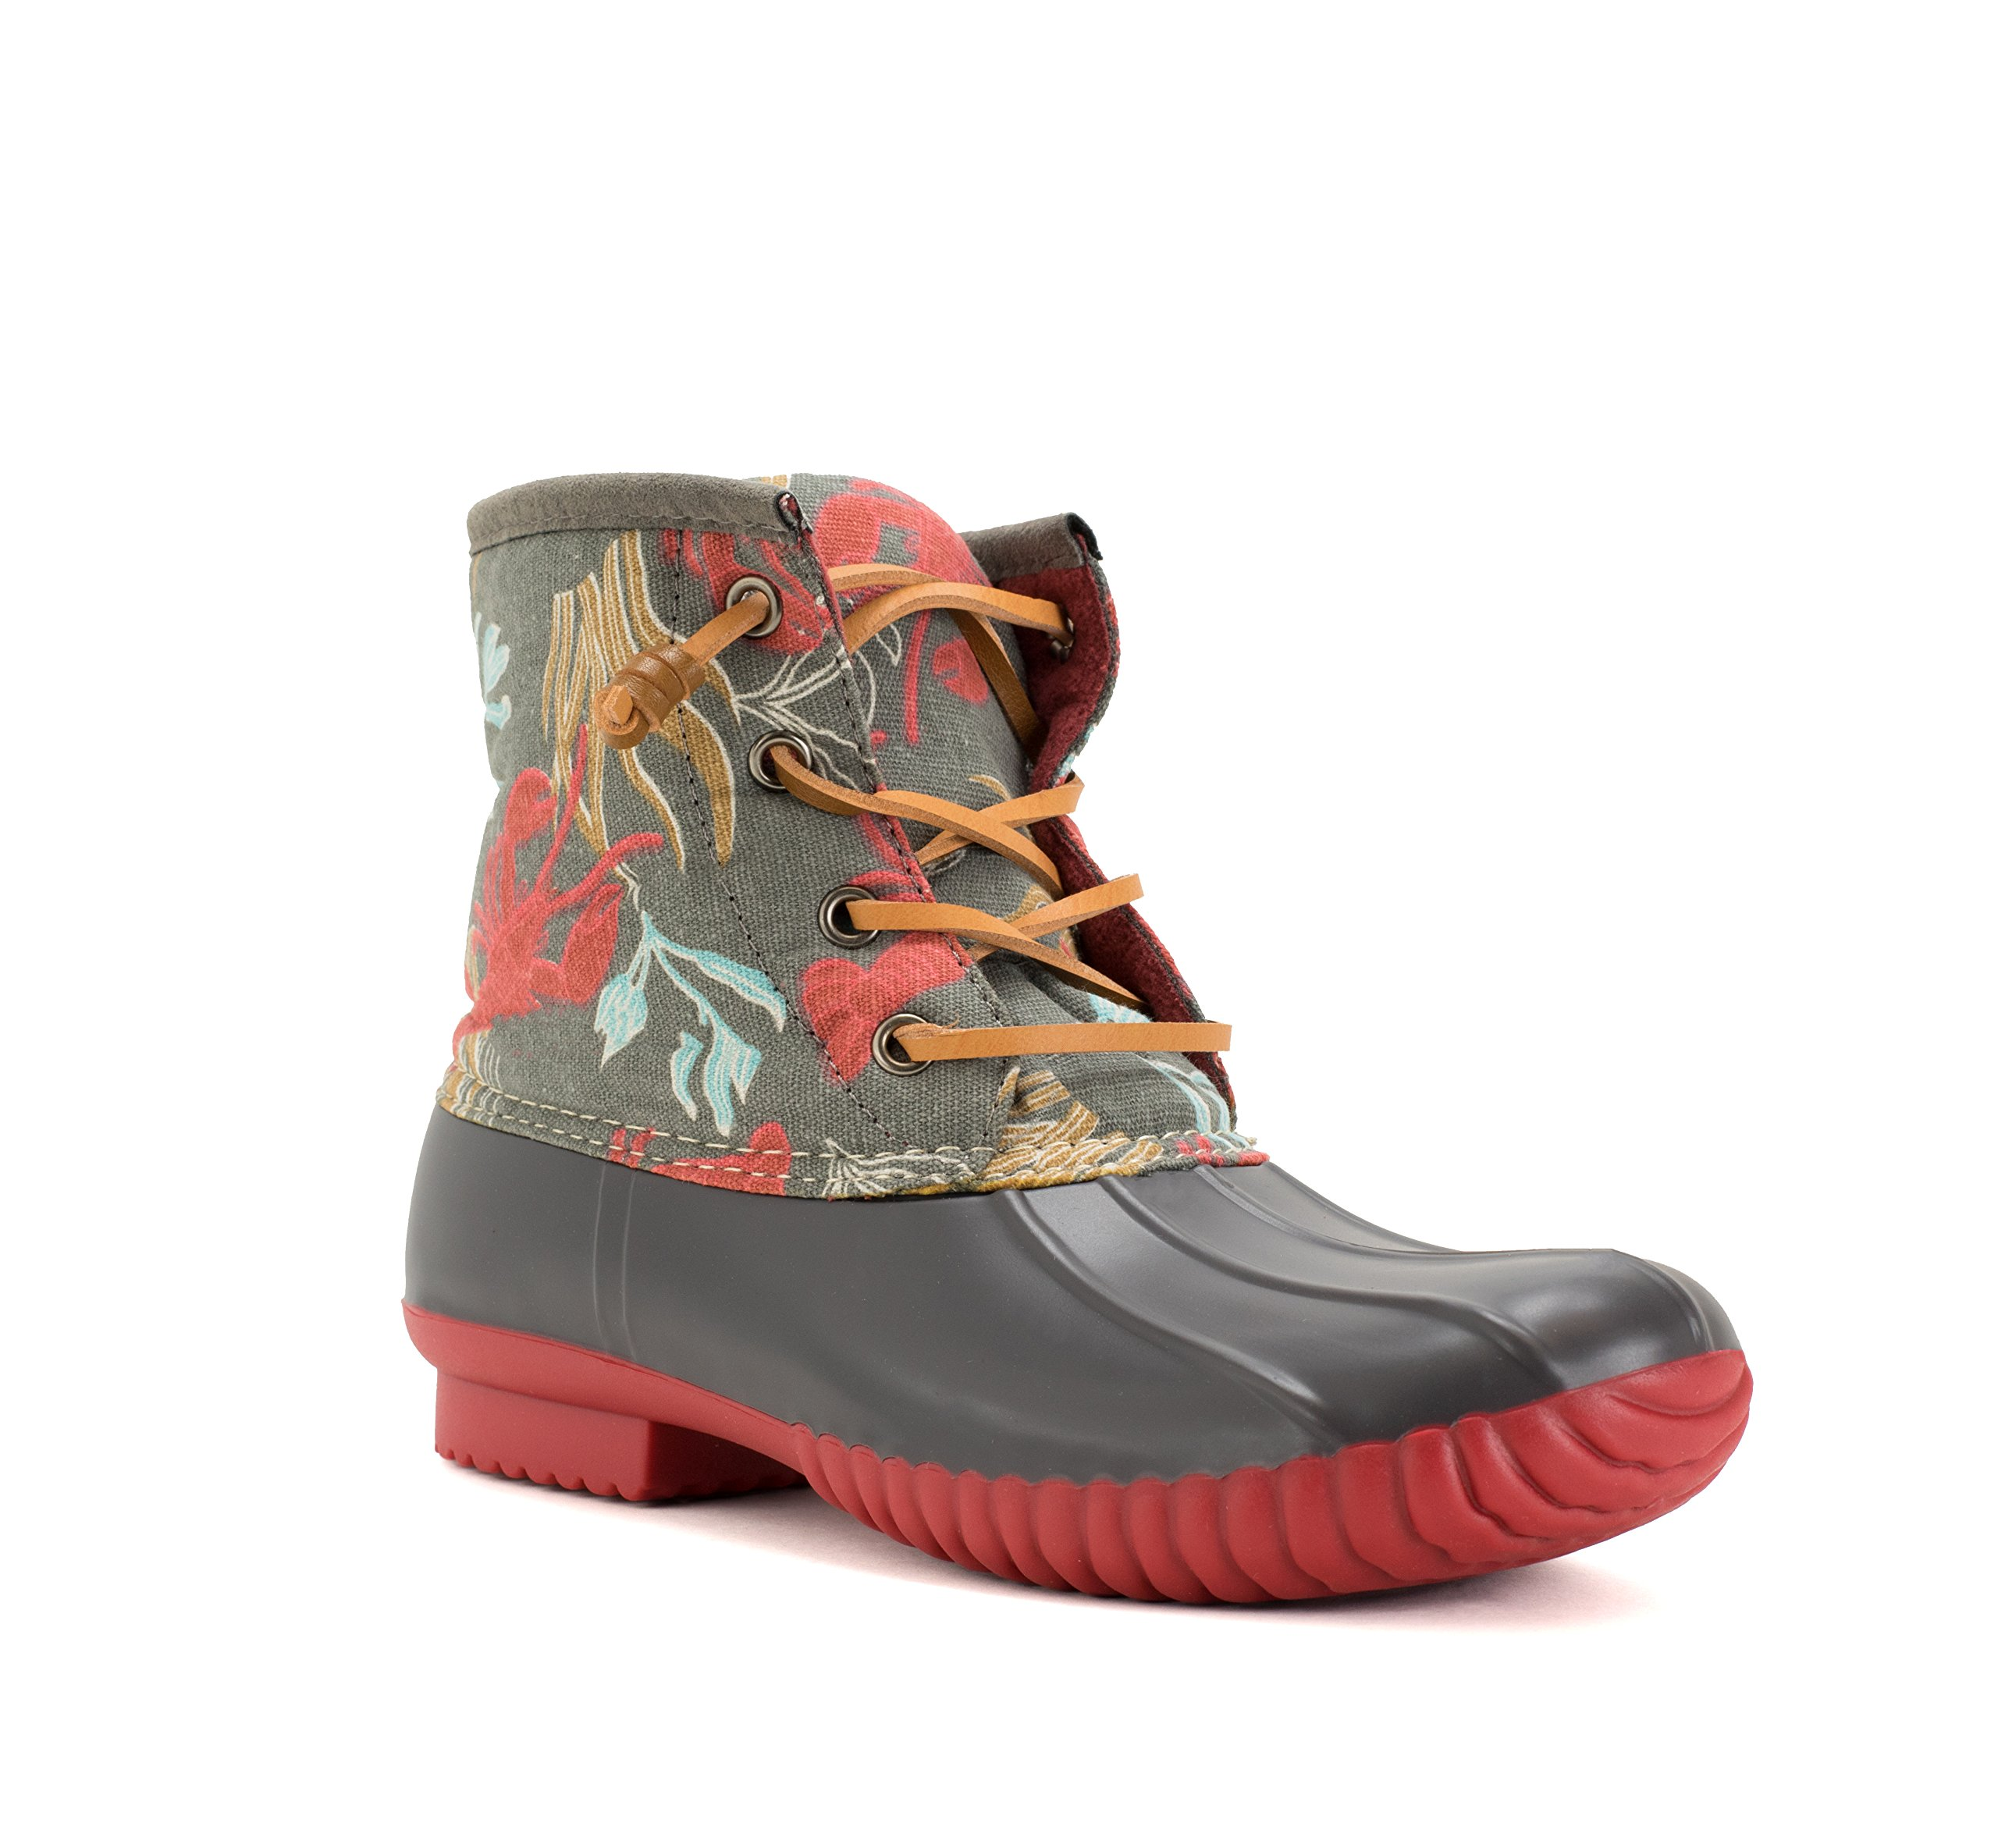 Avanti Lobstah Womens Duckboots - Rainboots (7)